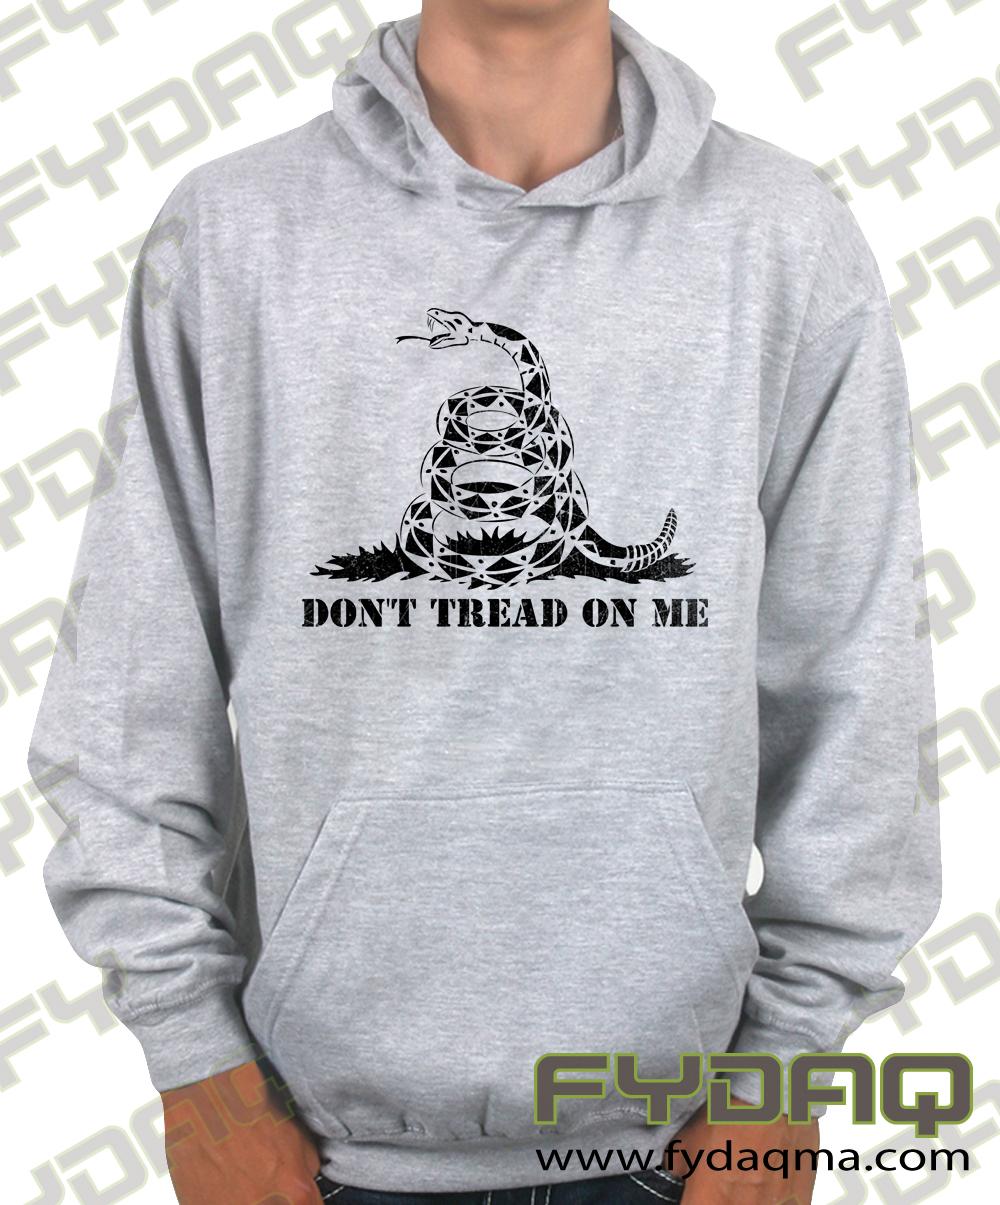 gadsden-flag-don't-tread-on-me-heather-grey-hoodie-fydaq